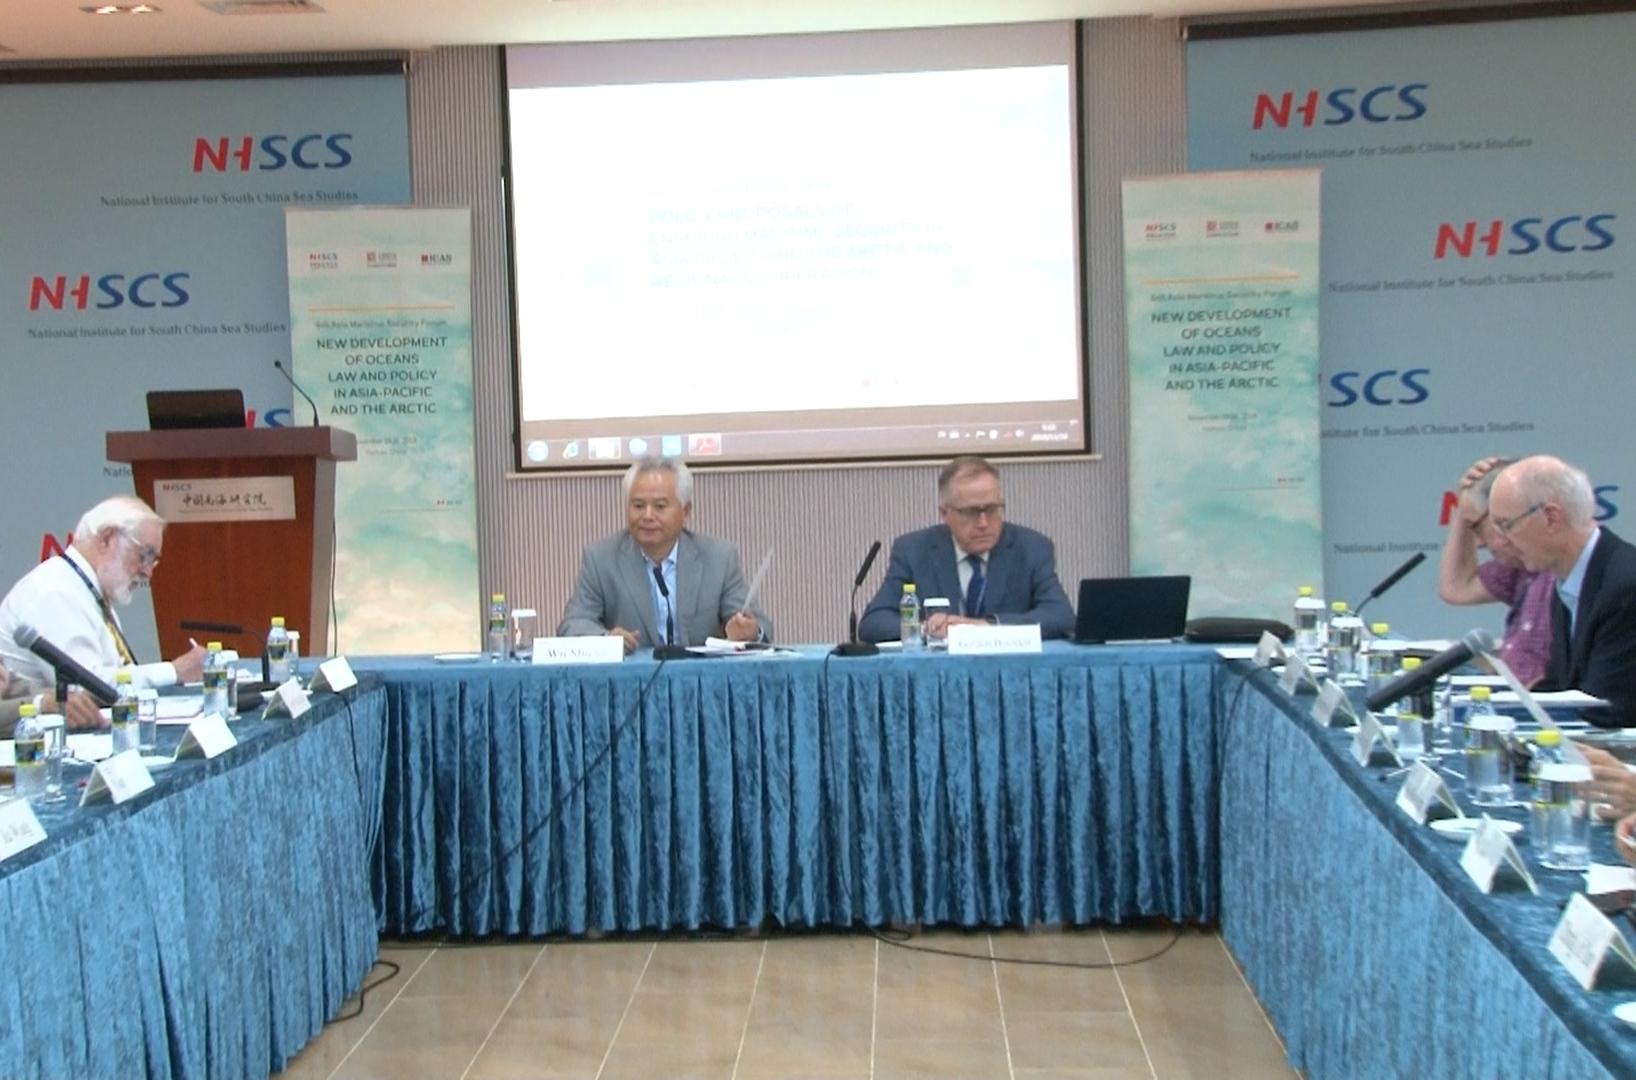 6th Asia Maritime Security Forum - ICAS